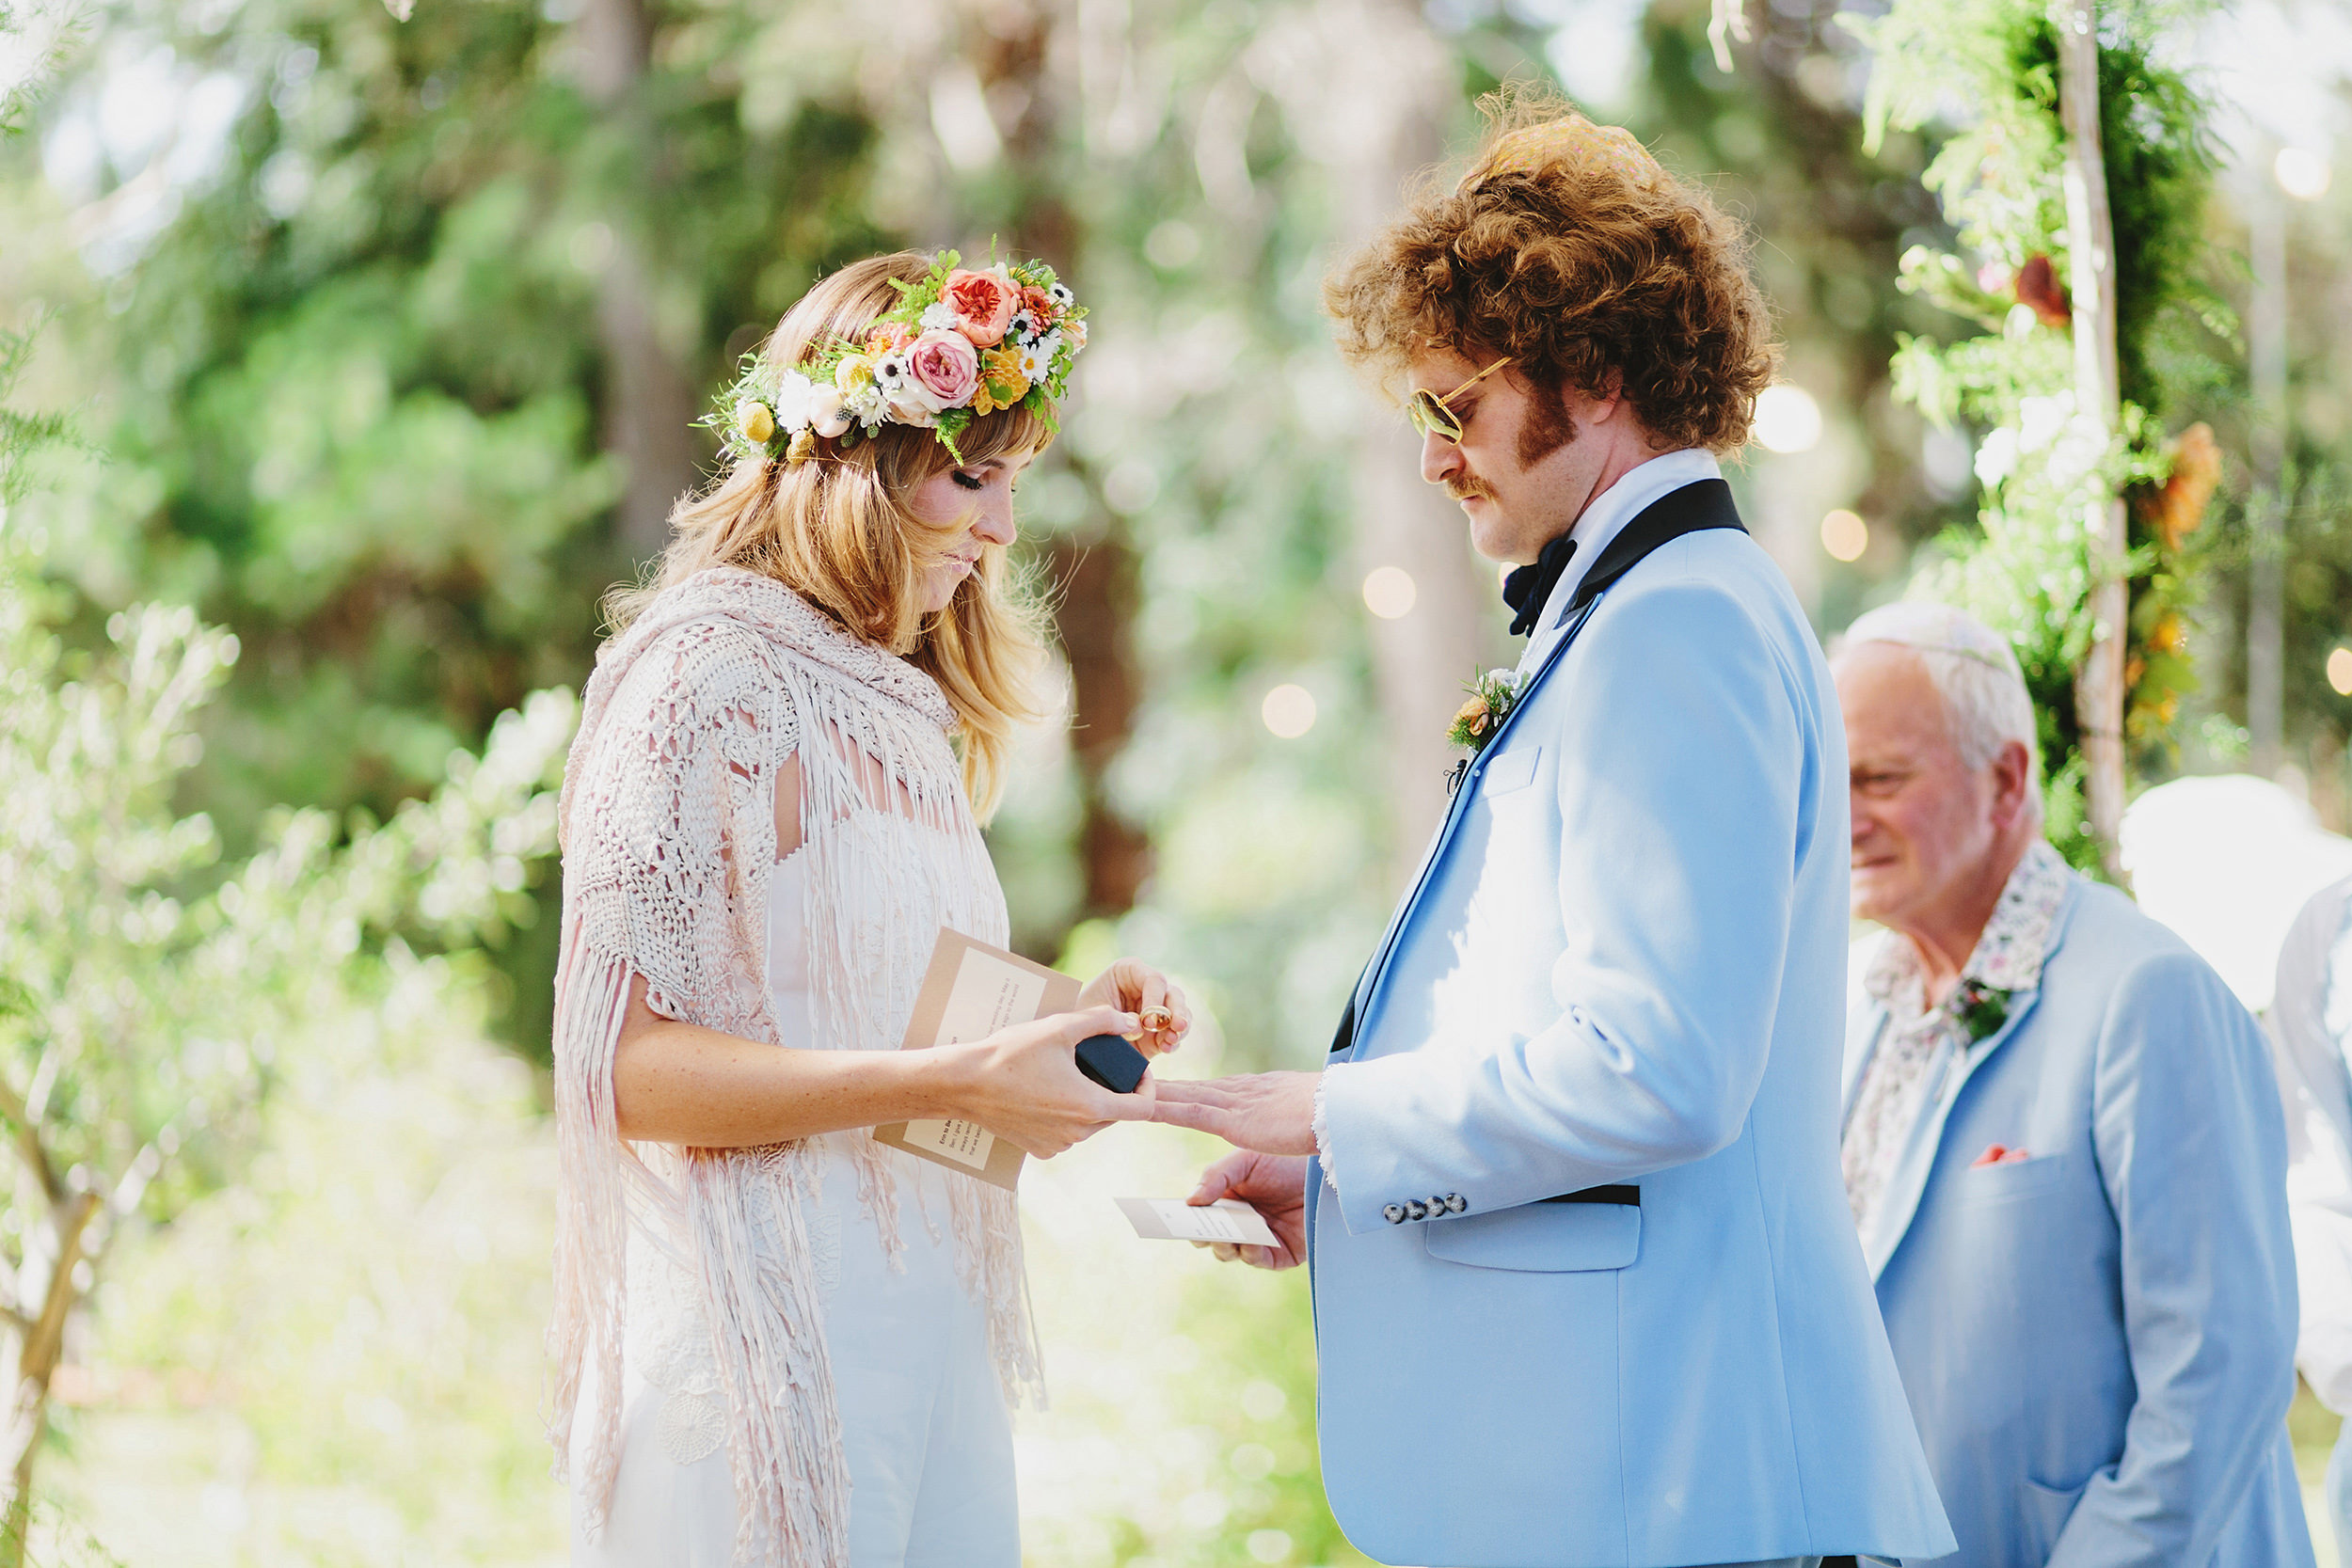 Melbourne_Vintage_Backyard_Wedding_Ben_Erin 037.JPG